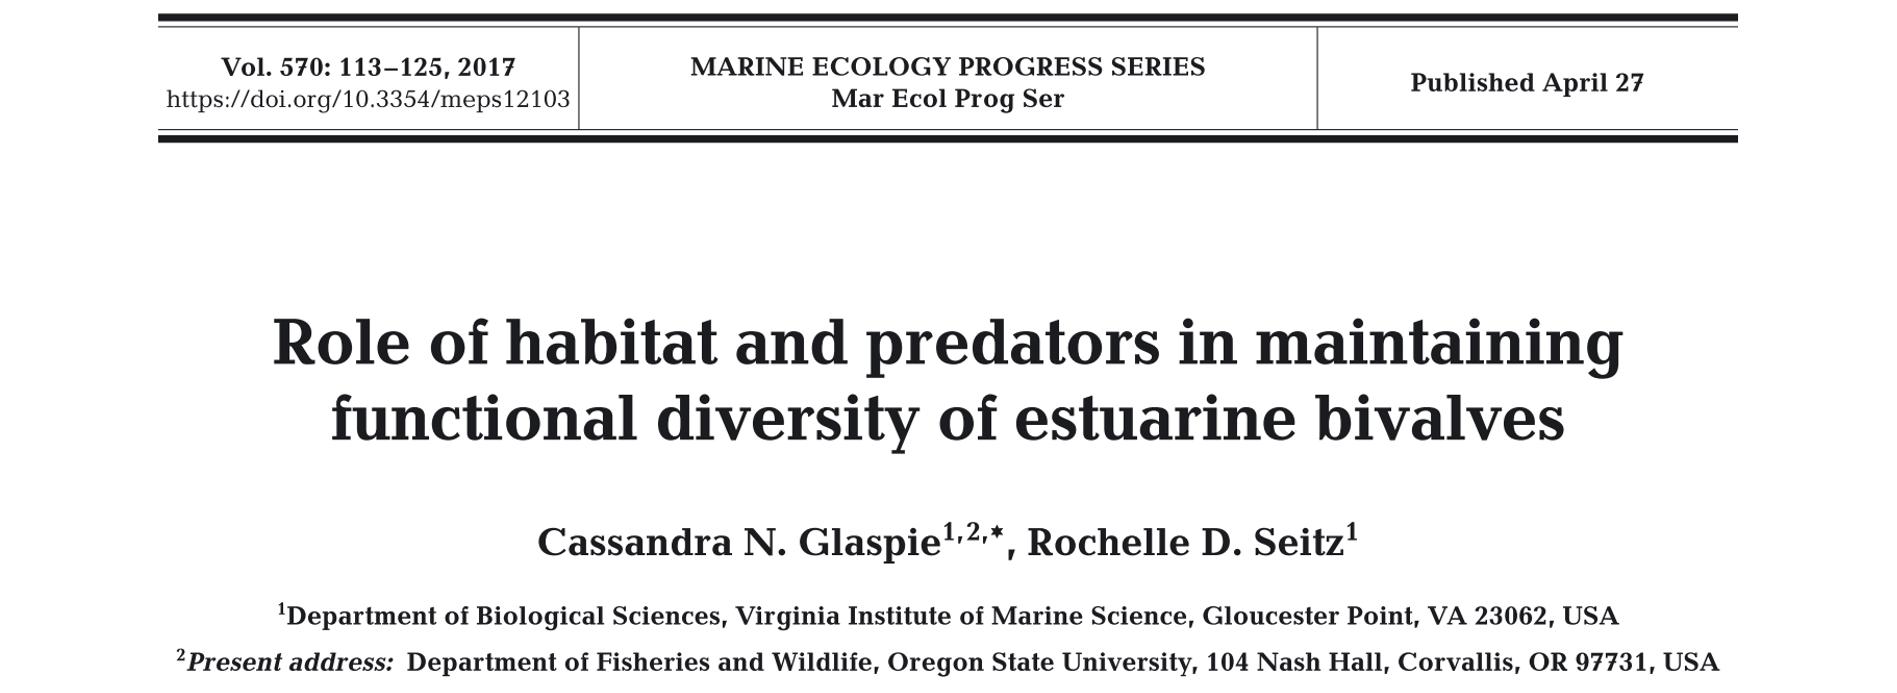 Glaspie Lab – Marine Community Ecology at Louisiana State